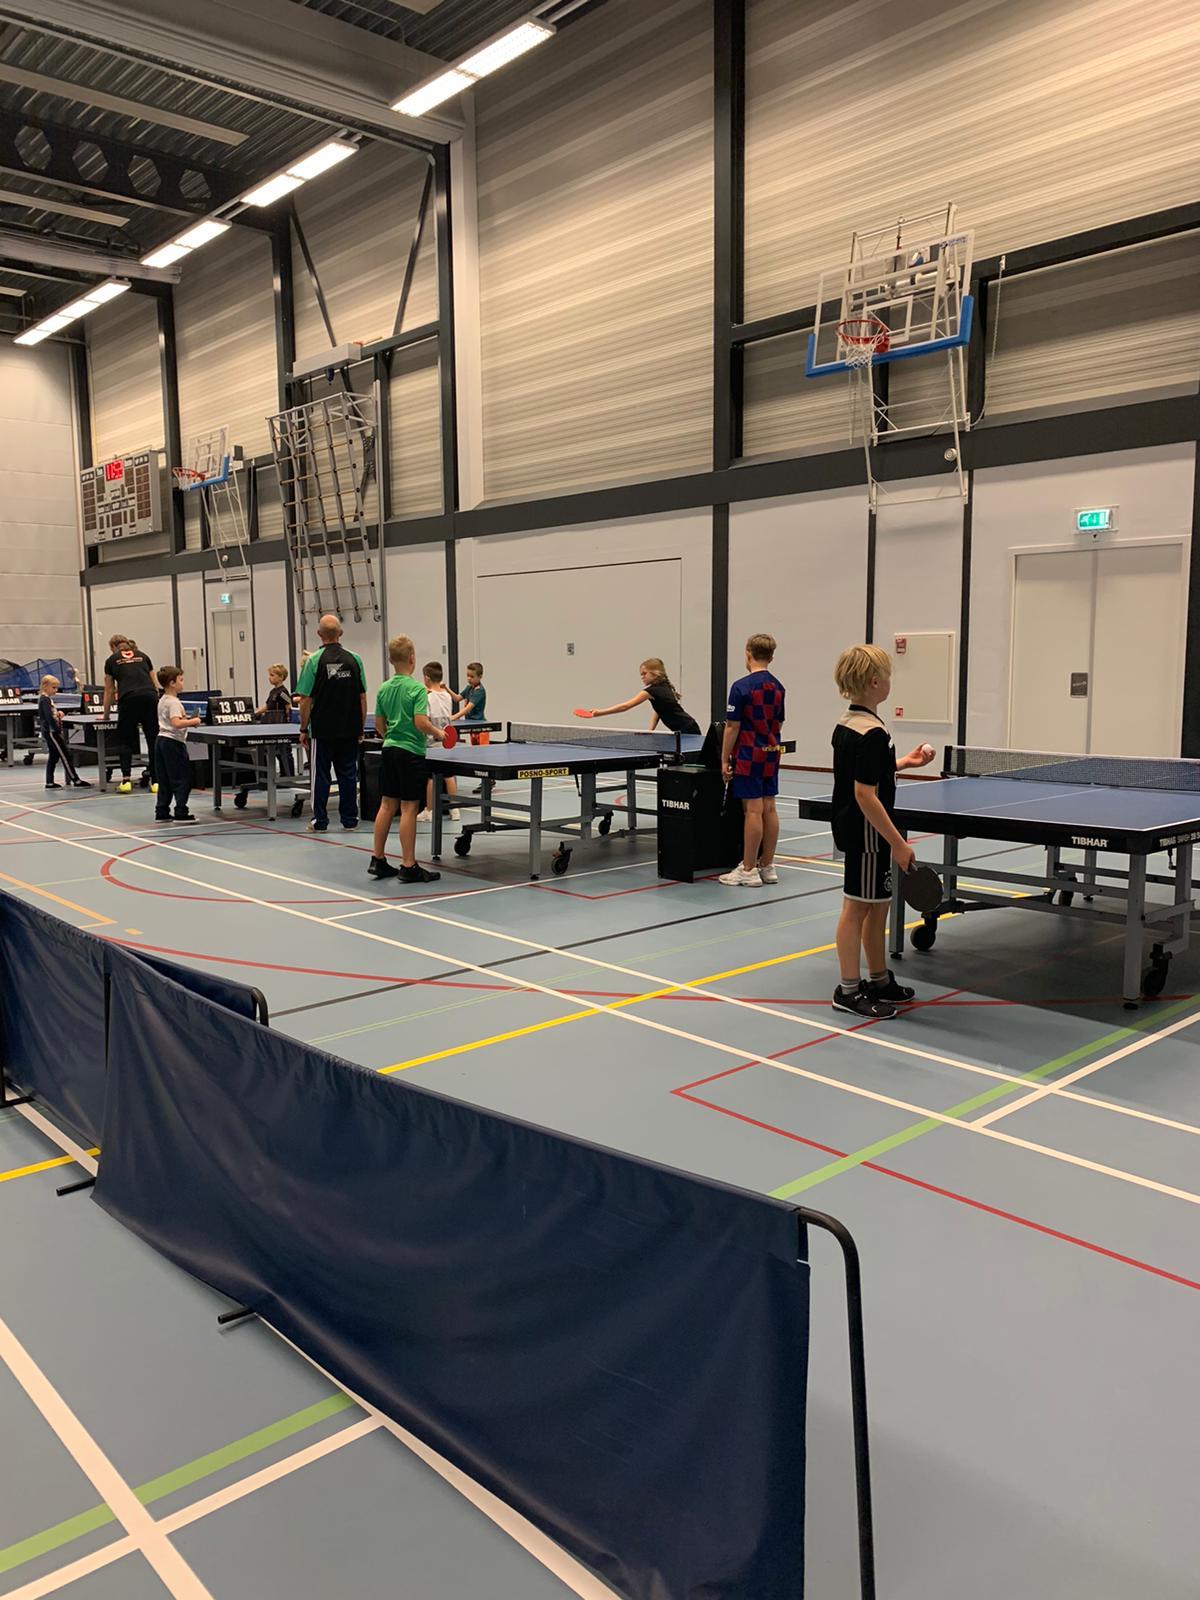 scholieren toernooien (foto CdH)